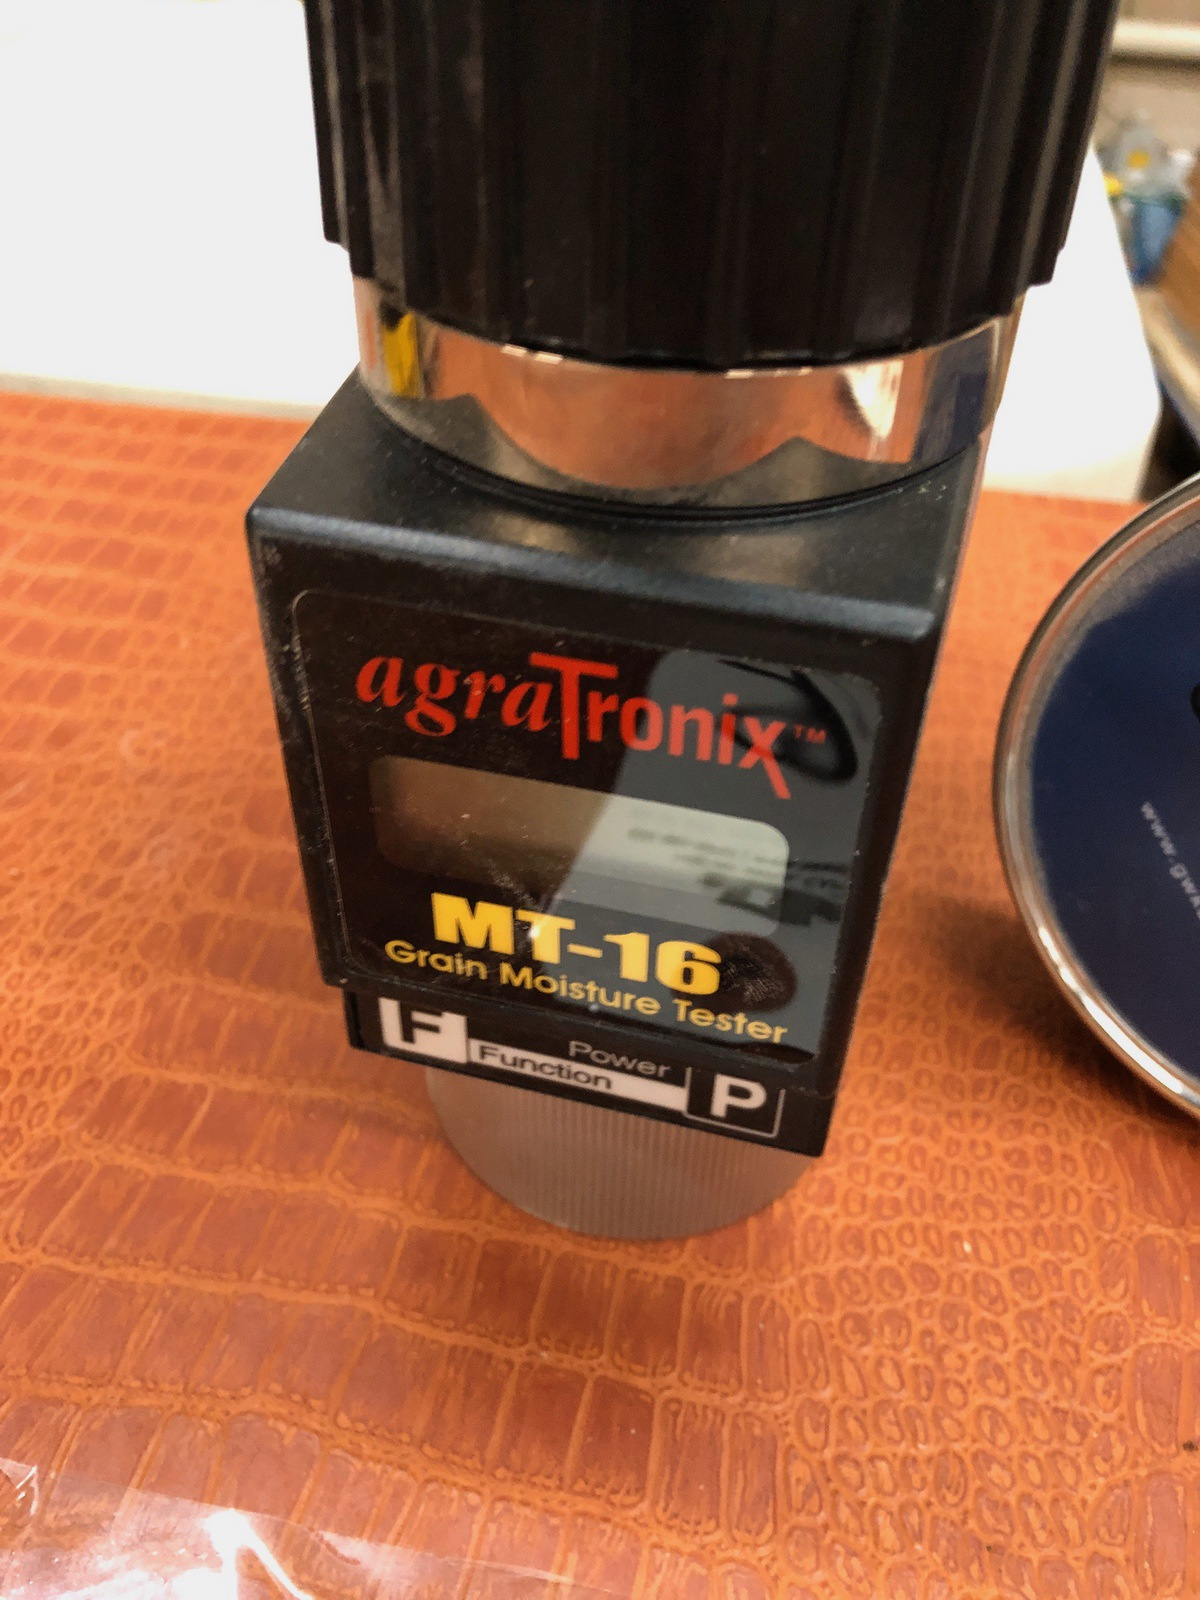 Lot 35 - AgraTronix MT-16 Grain Moisture Tester | Sub to Bulk | Rig Fee: $30 or HC